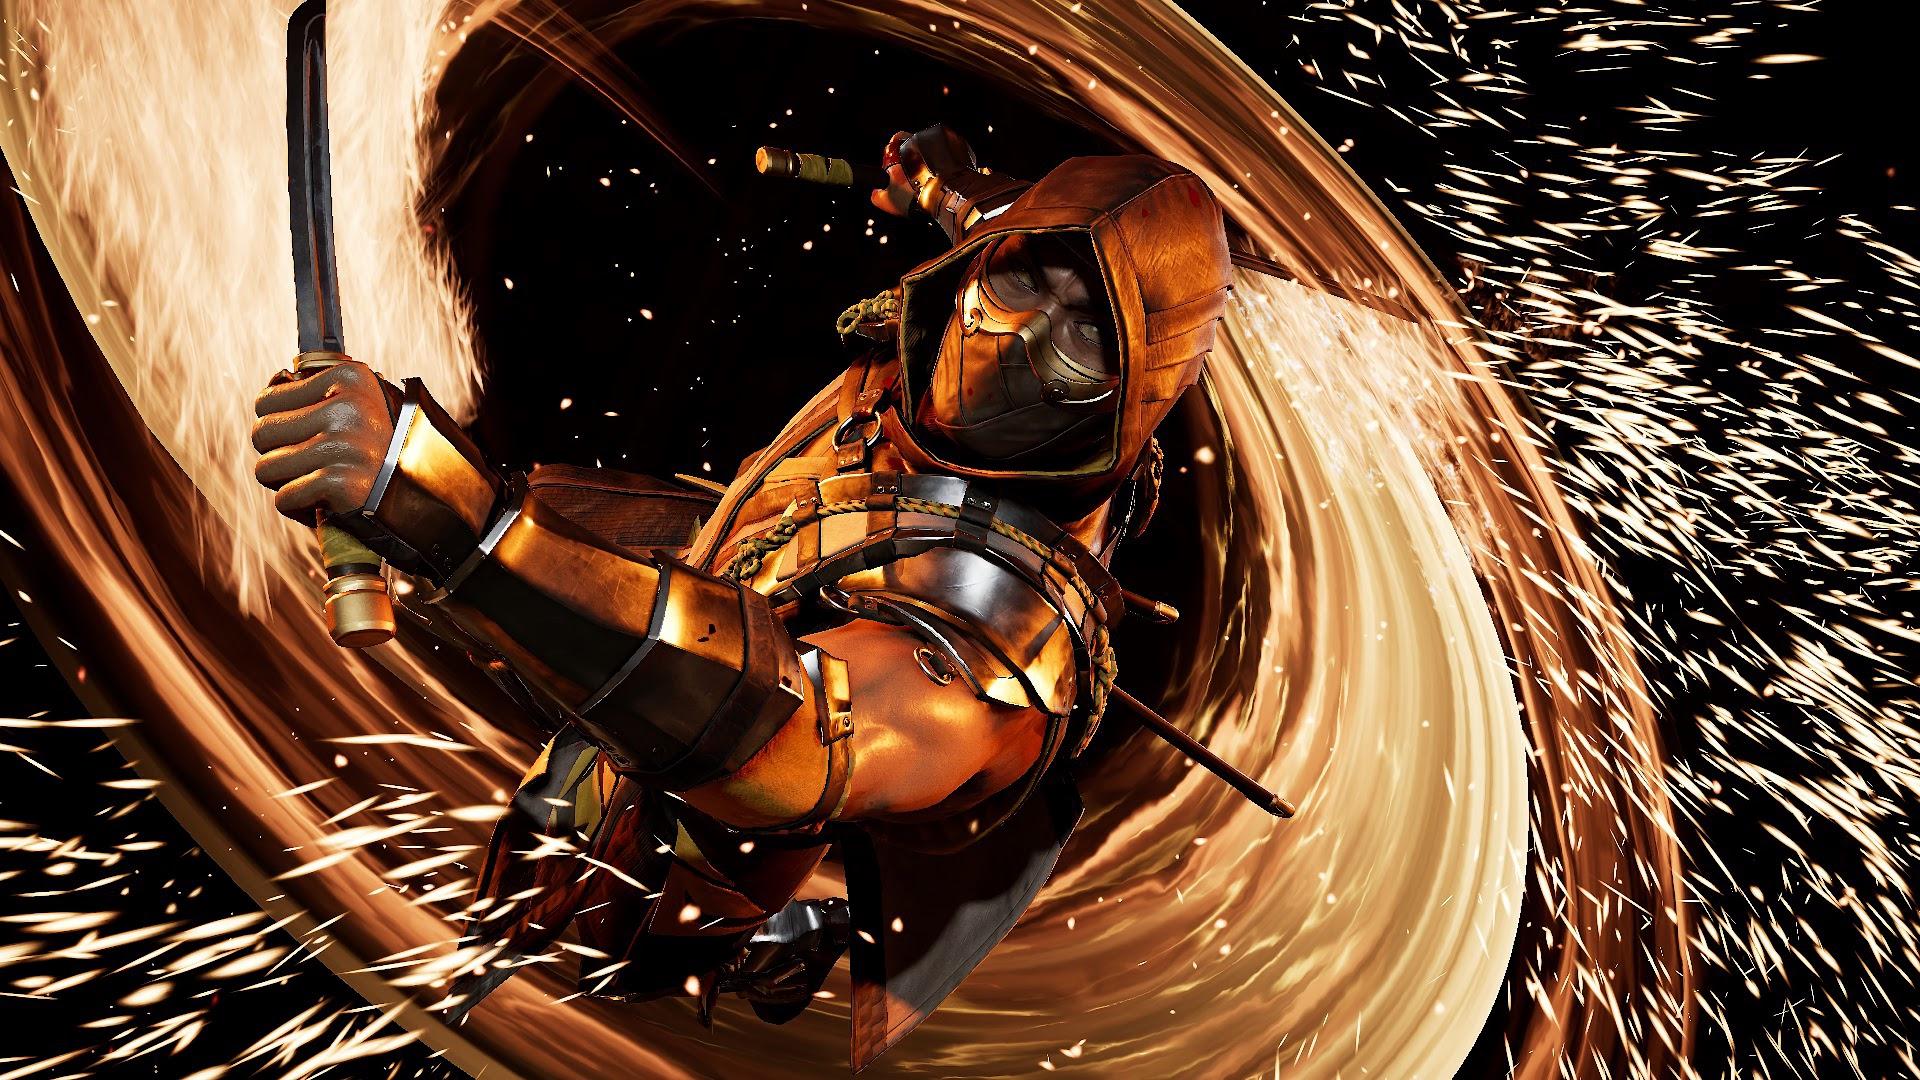 Scorpion, Mortal Kombat 11, 4K, #164 Wallpaper